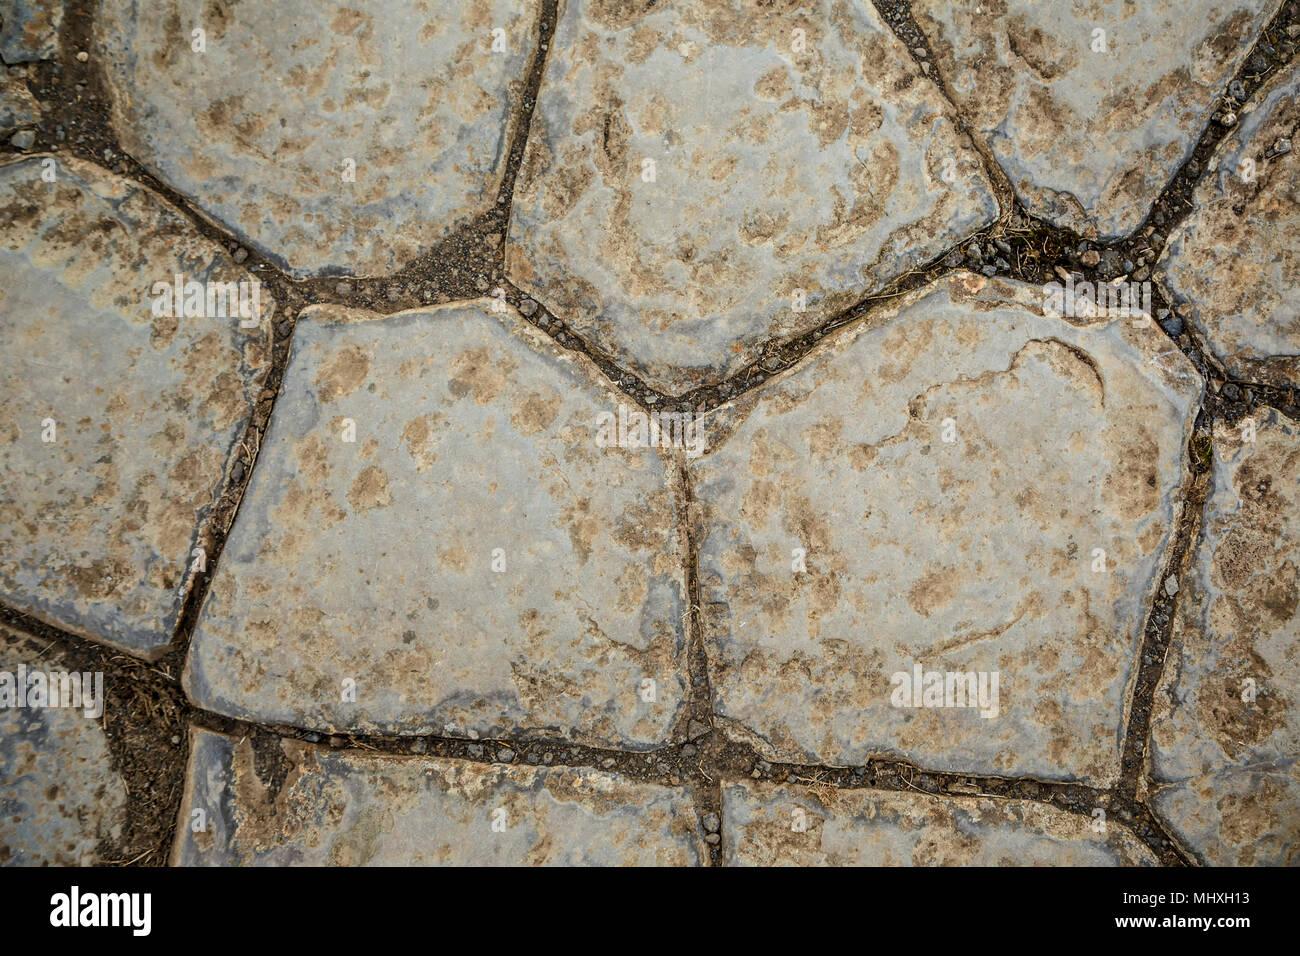 The Church Floor (Kirkjugolfid) columnar basalt outcrop, Kirkjubaejklastur, Iceland - Stock Image